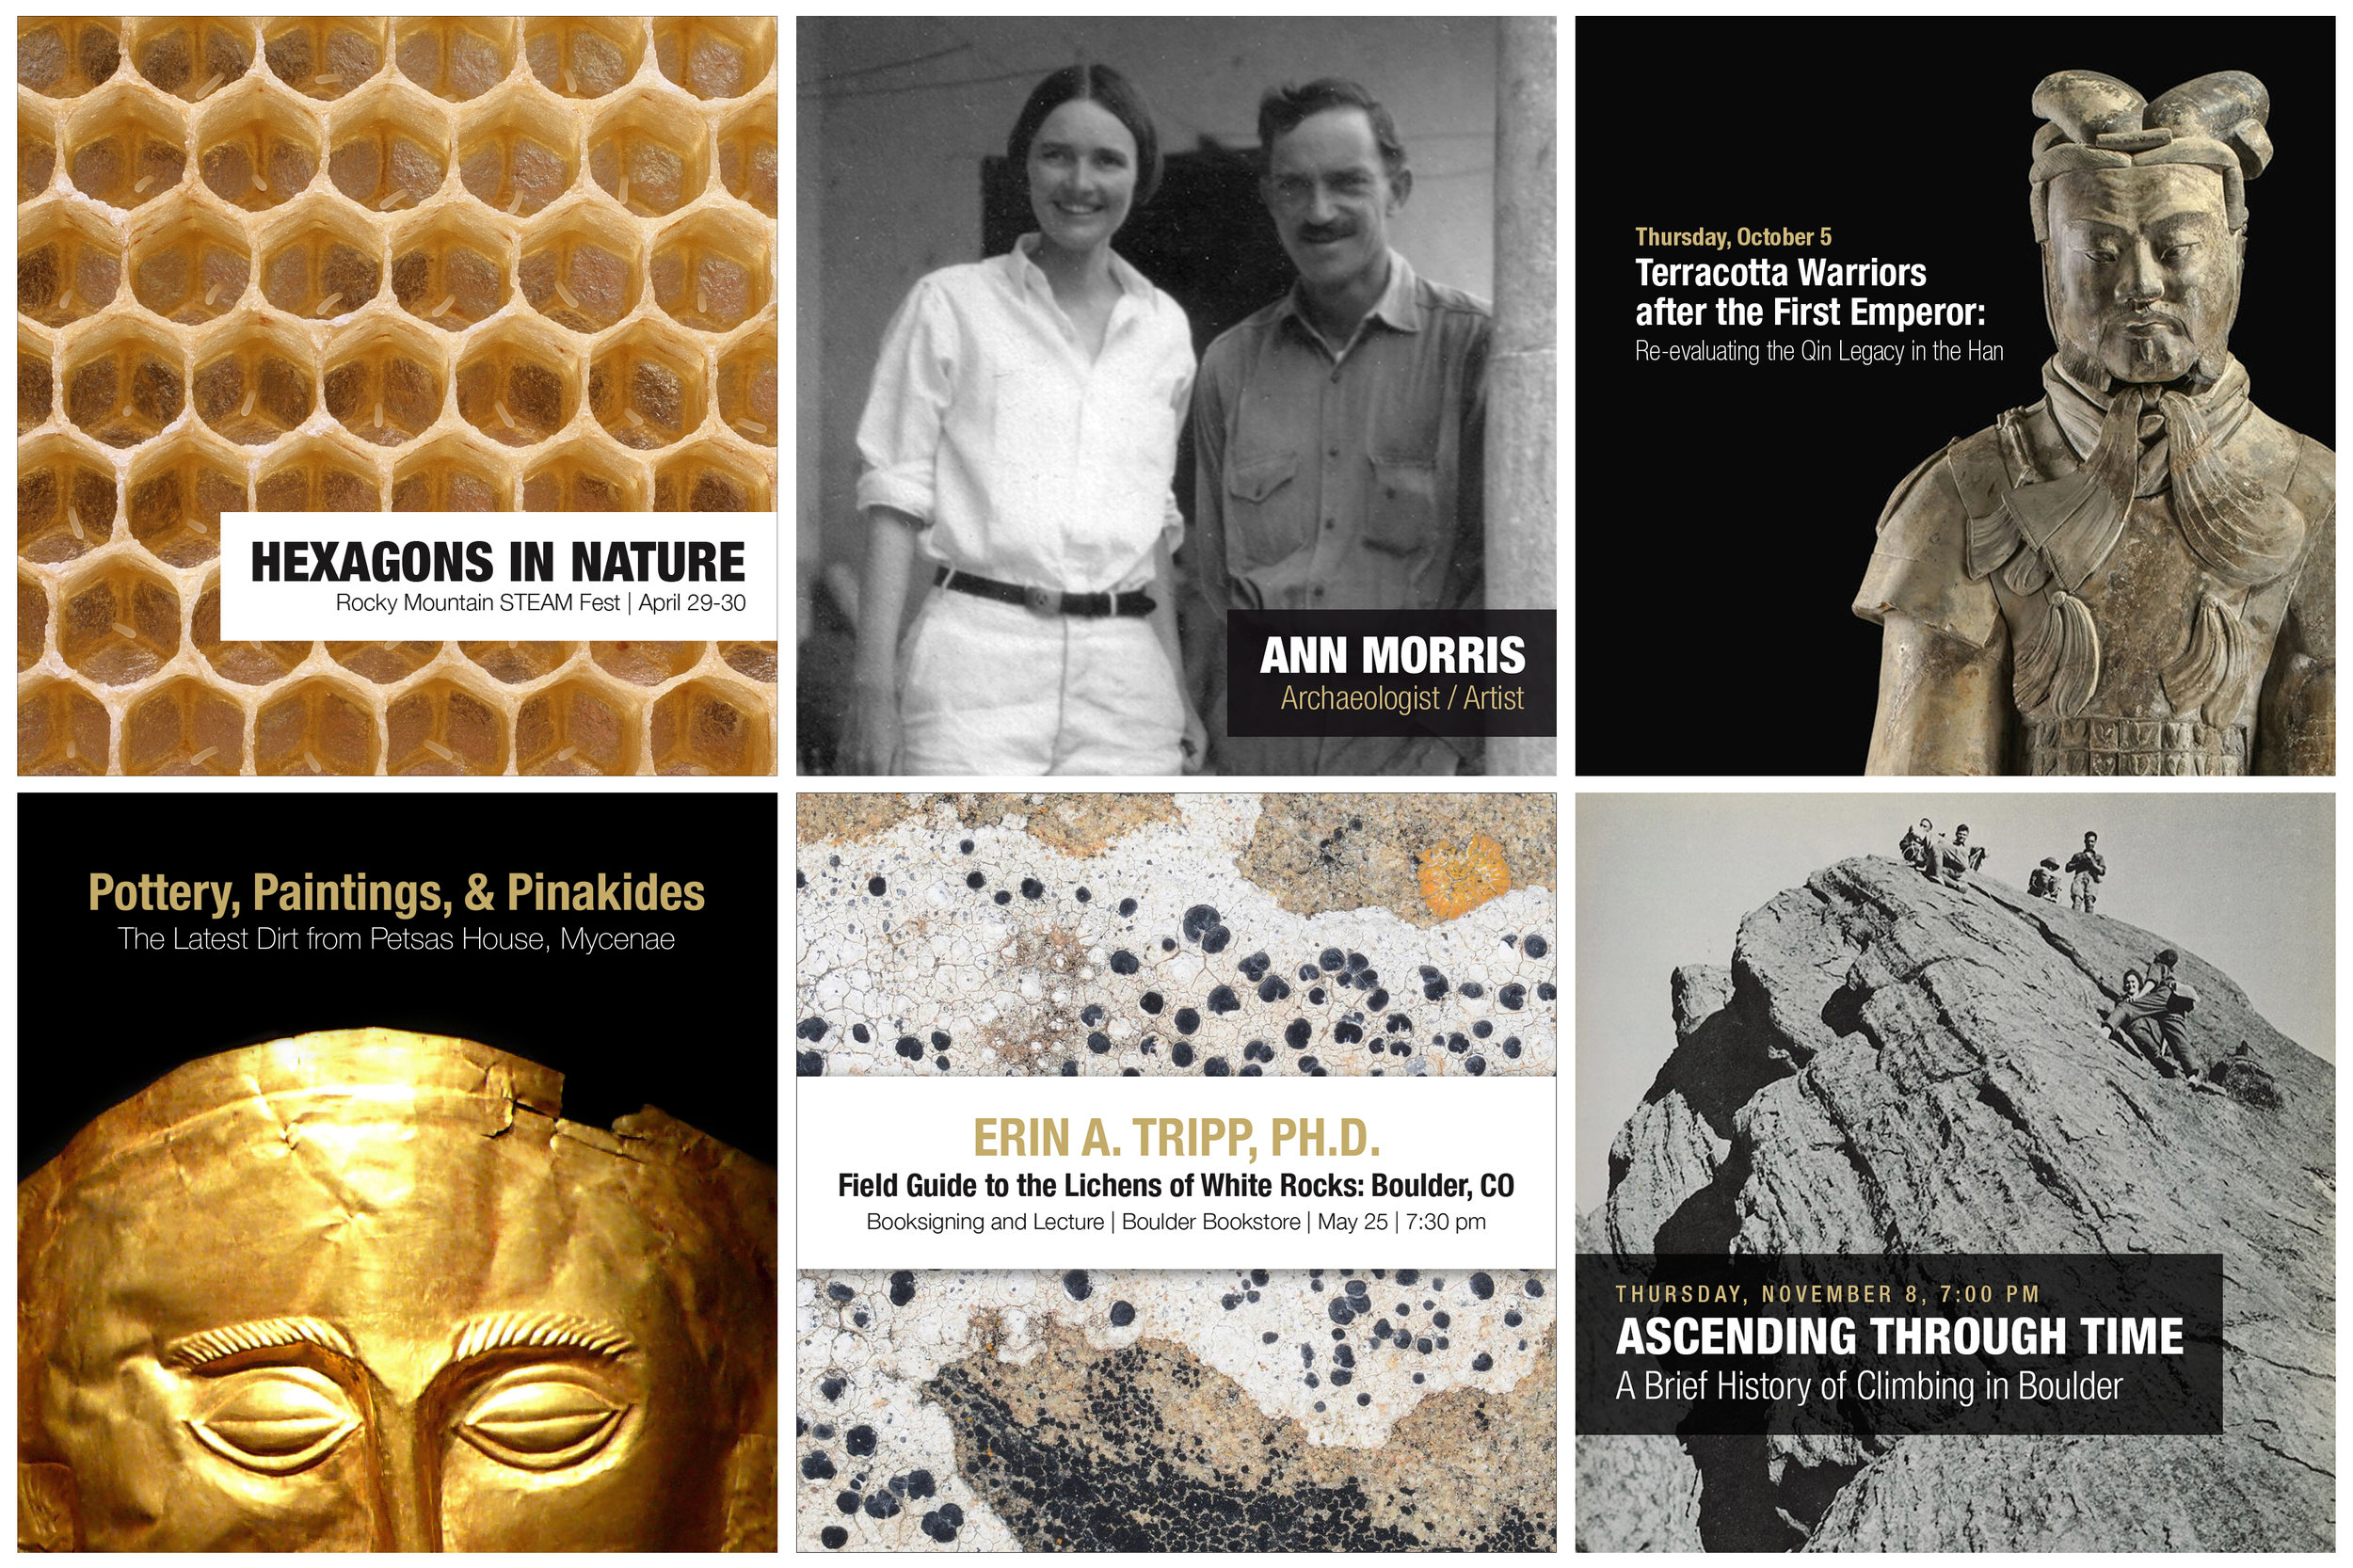 Branded Instagram Ads  University of Colorado Natural History Museum Adobe Photoshop